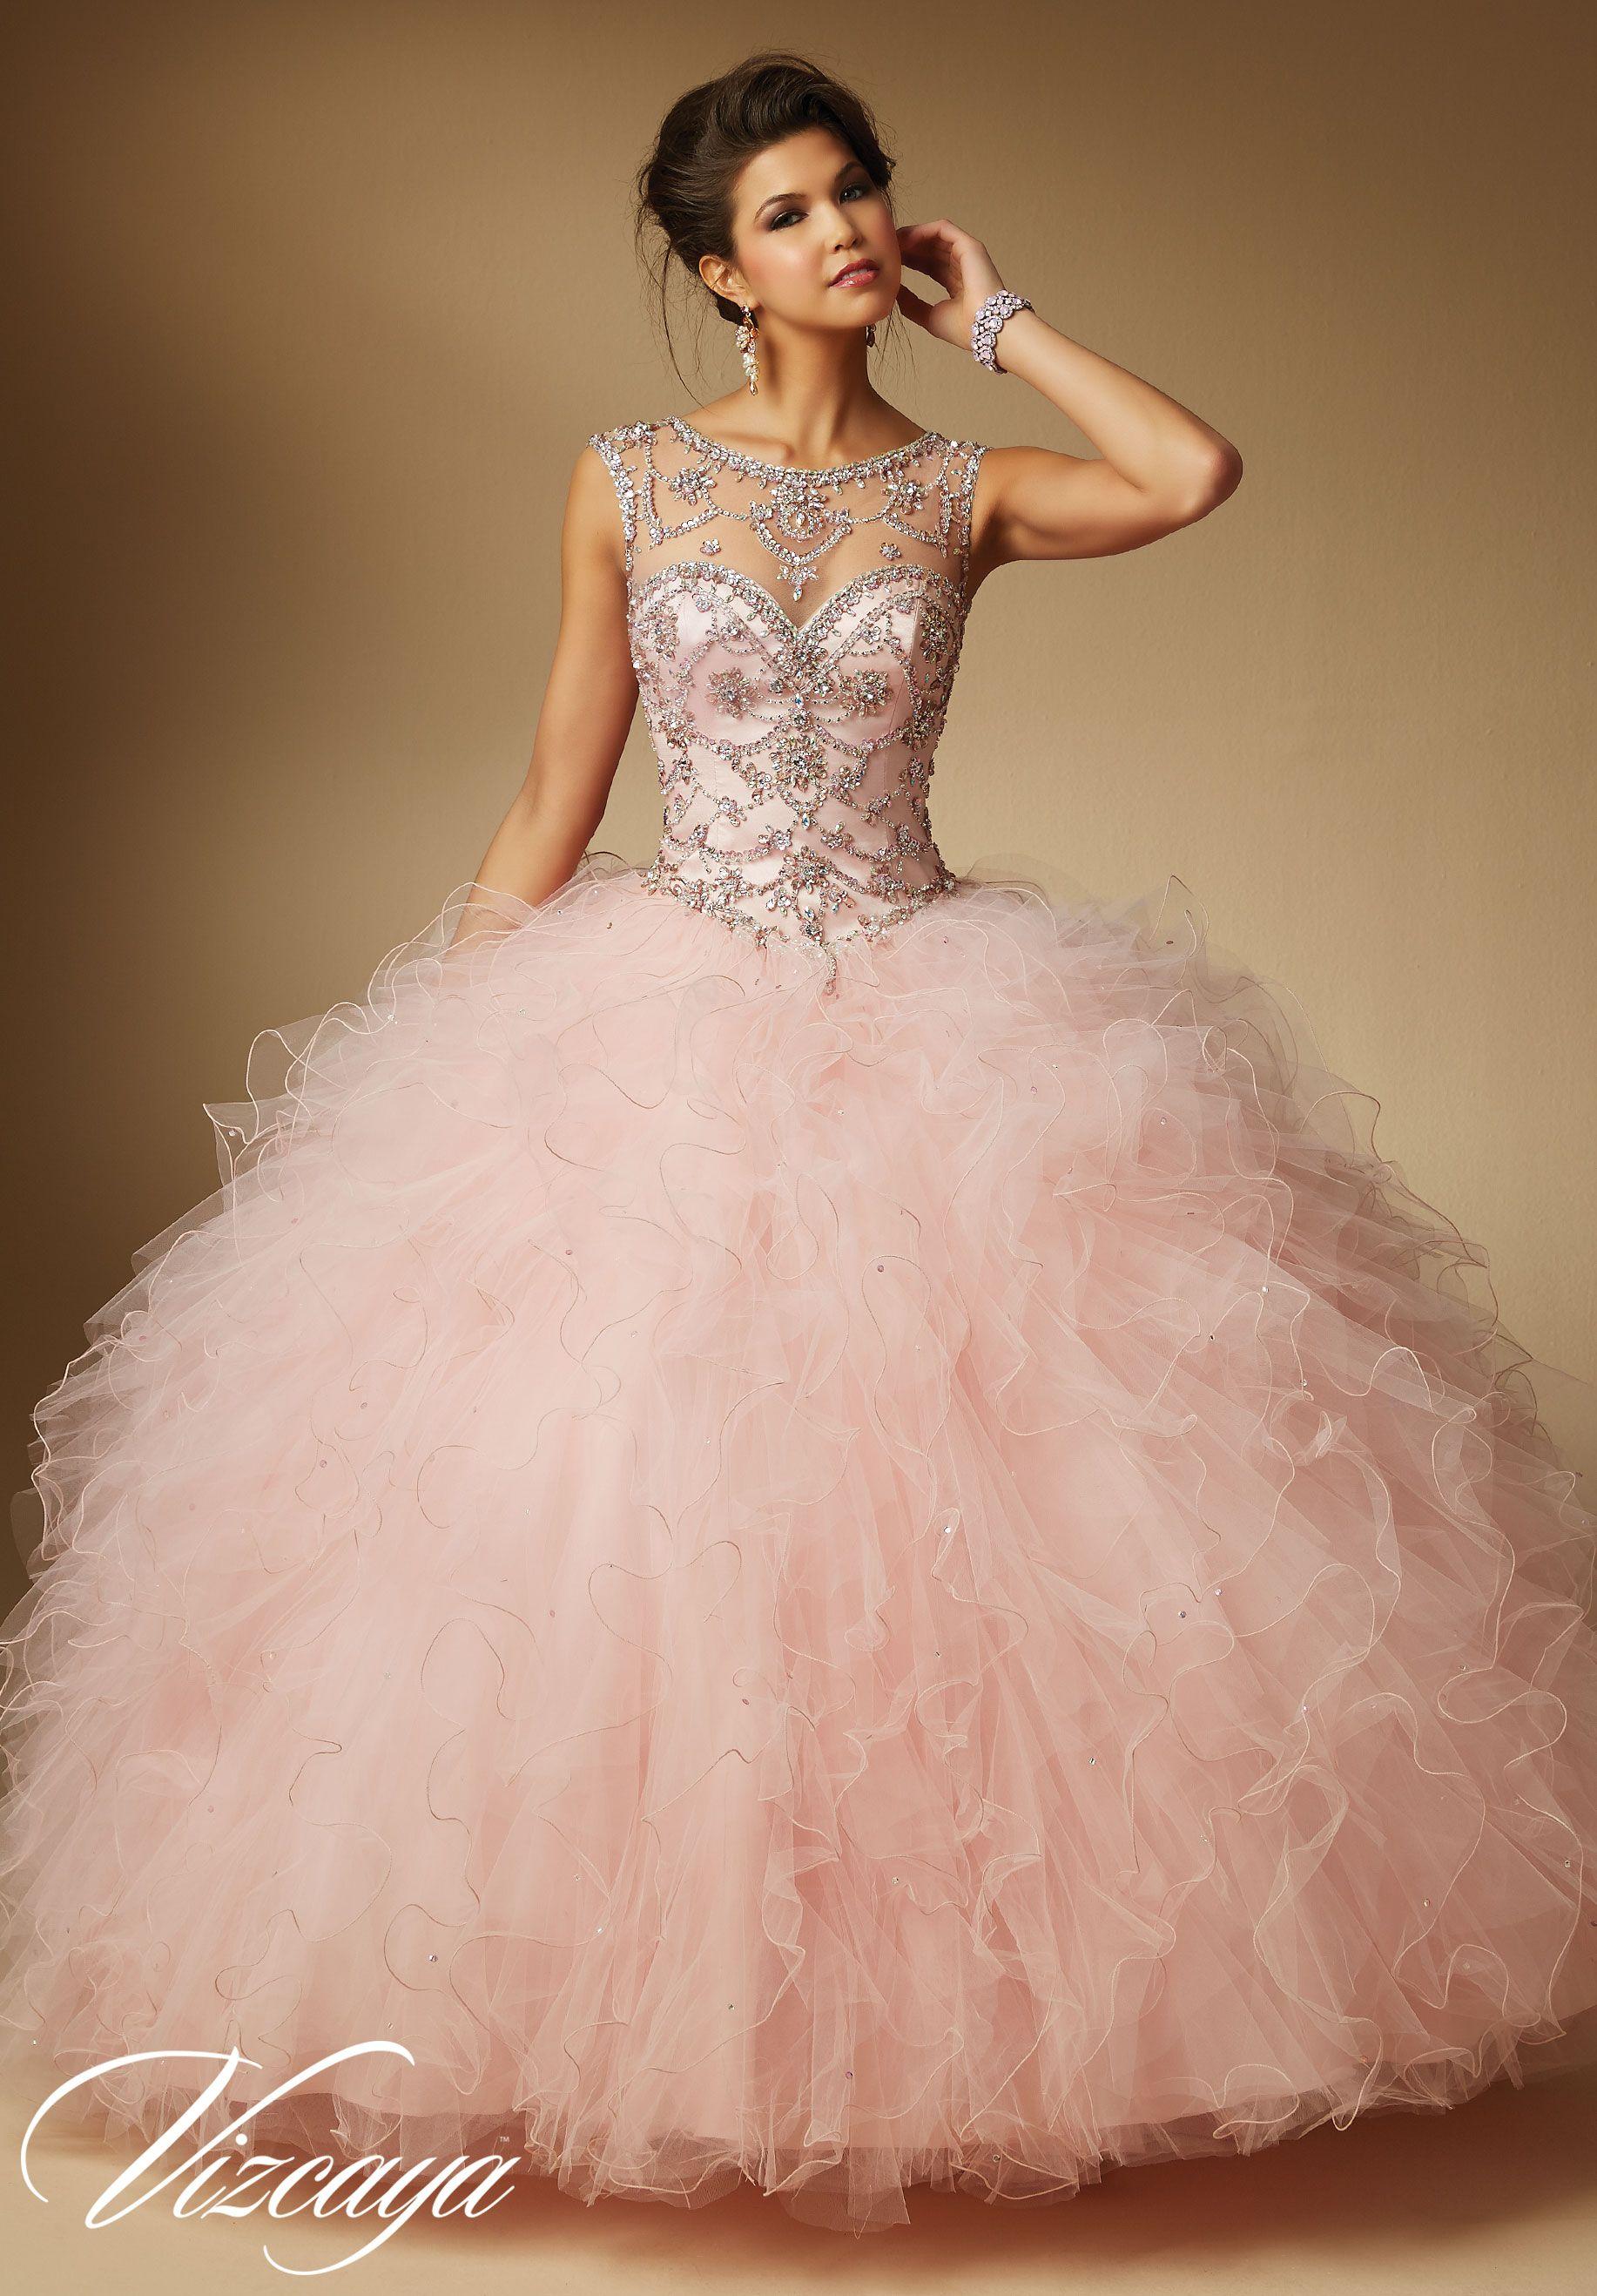 Ballroom Prom Dresses 2015